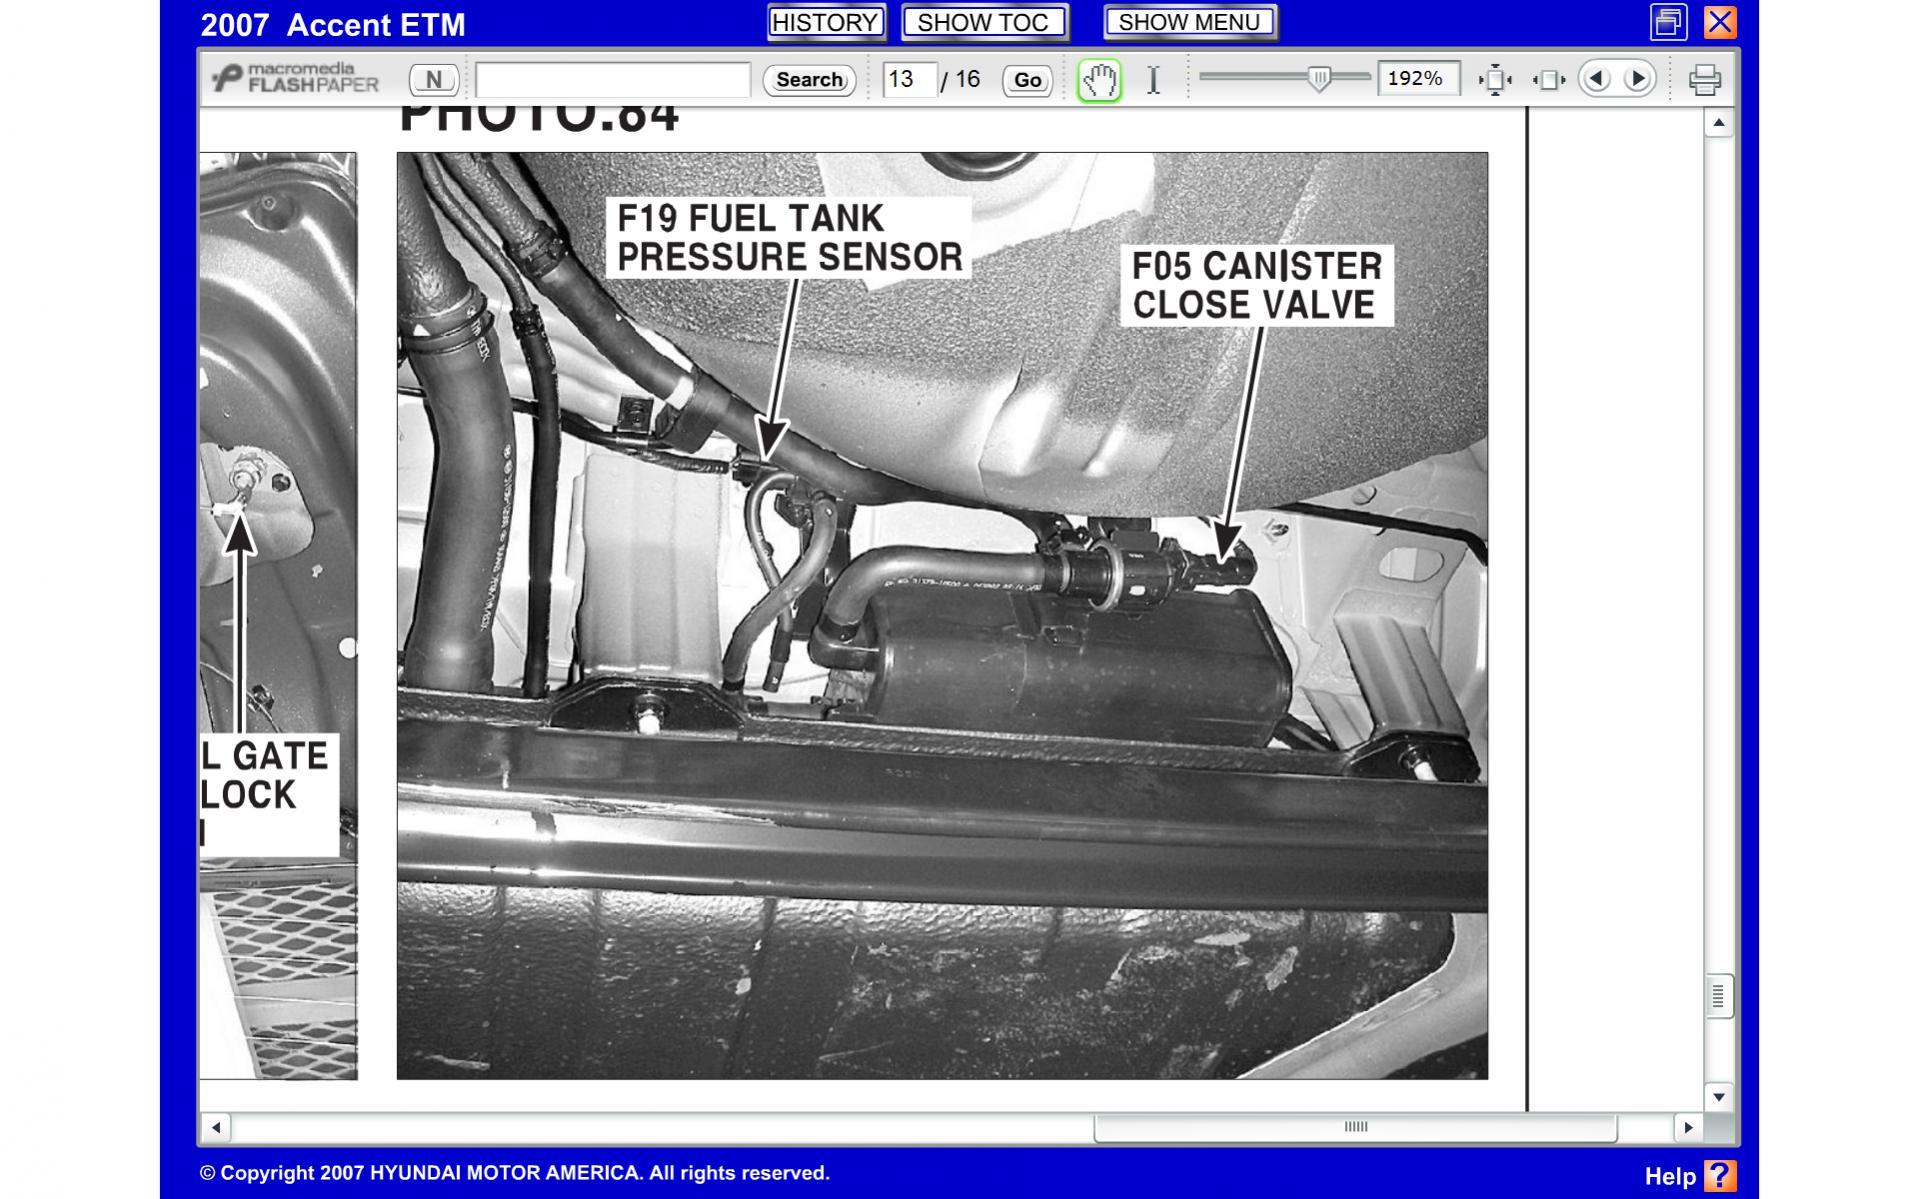 2009 hyundai evap diagrams vapor vent valve and evap canister location hyundai forums  vapor vent valve and evap canister